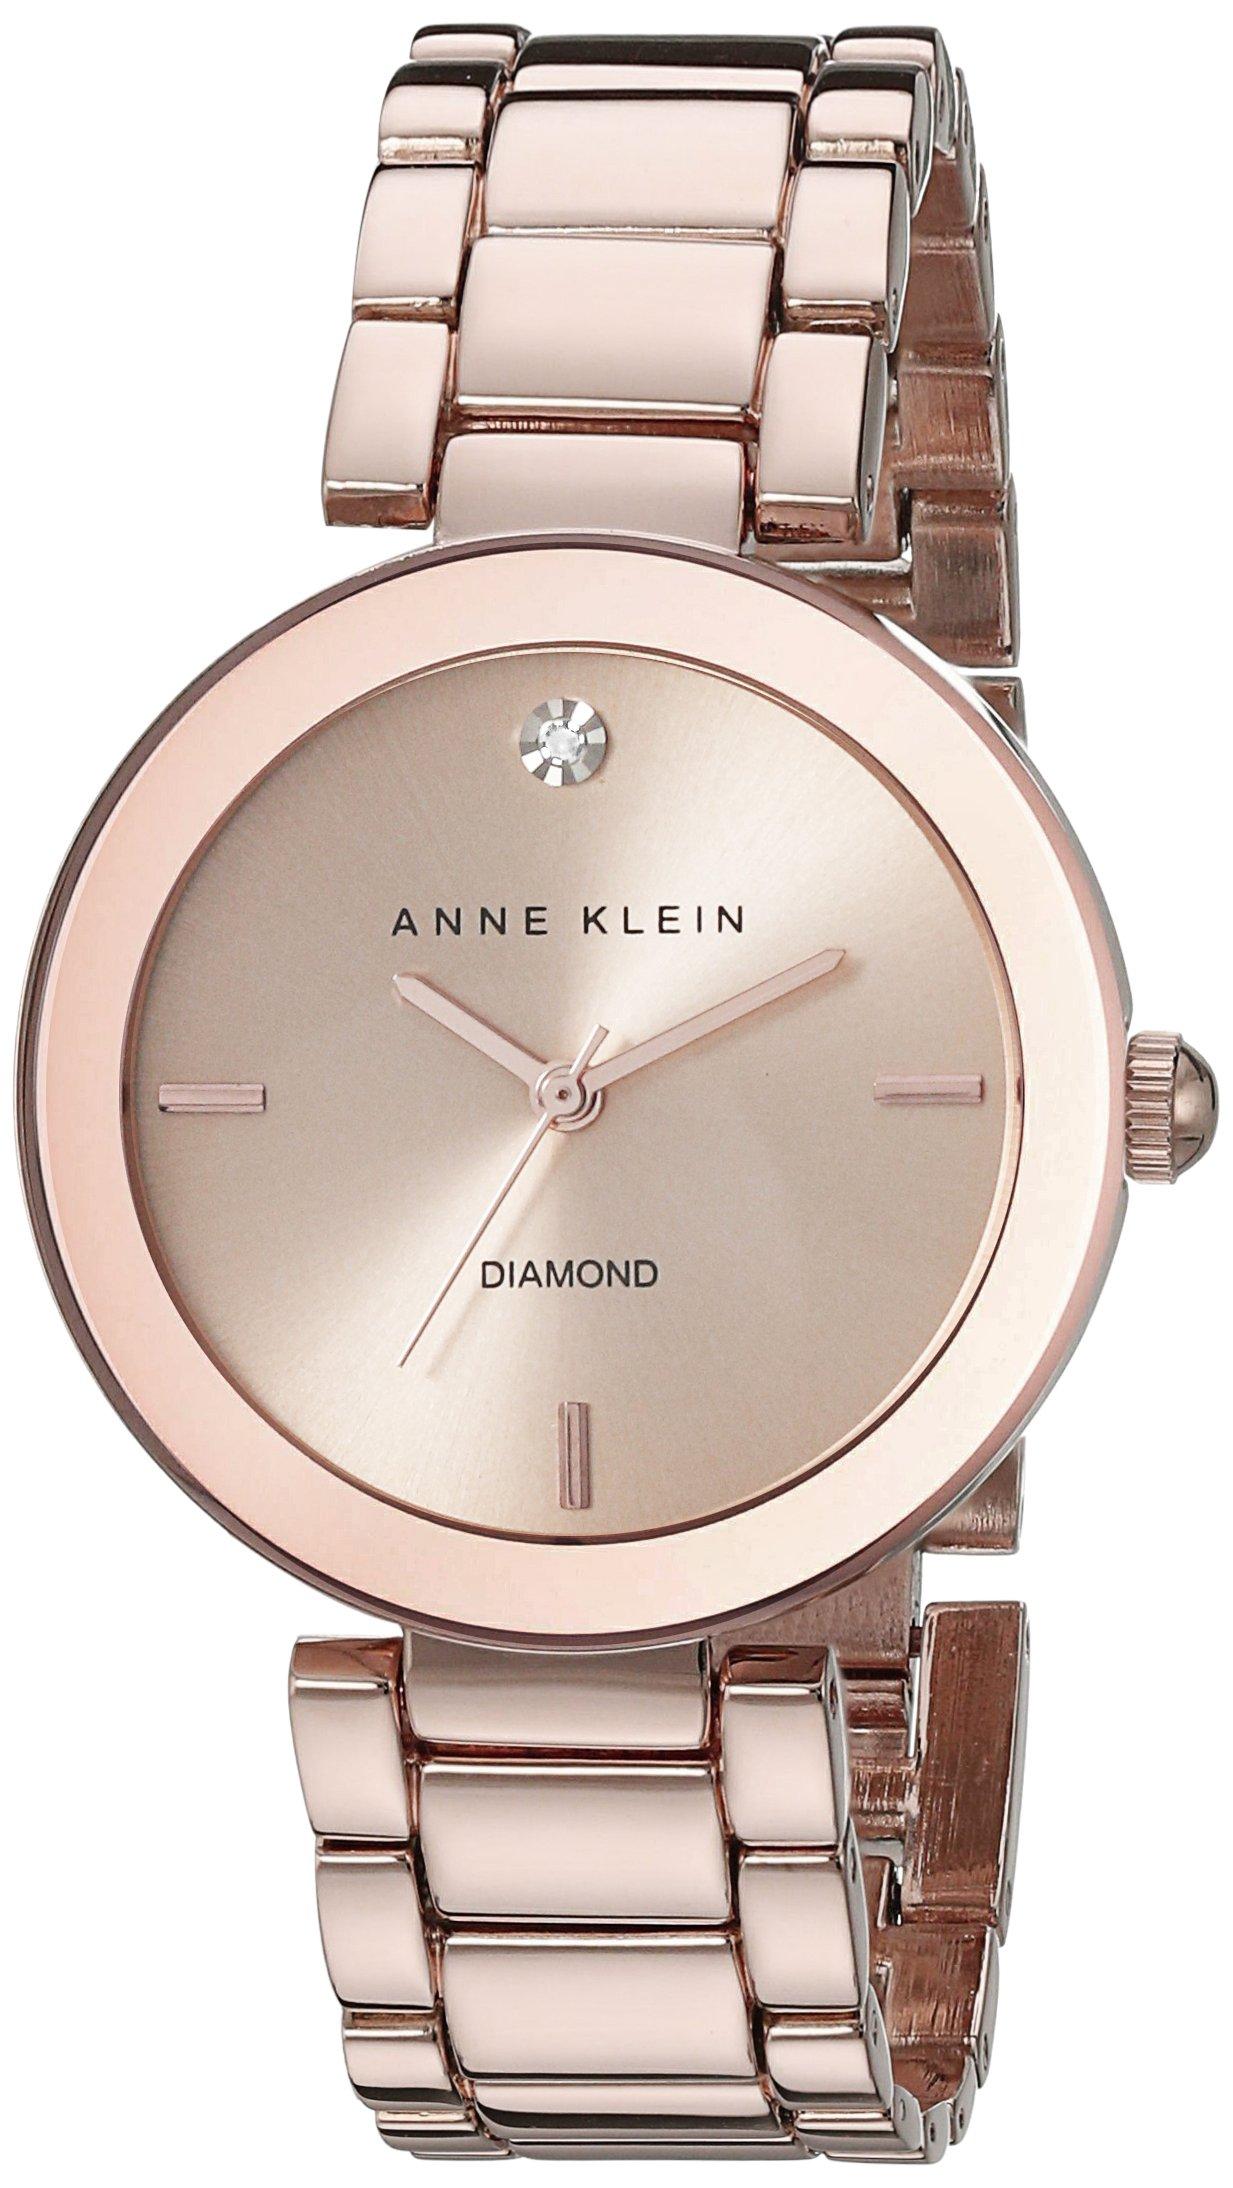 Anne Klein Women's AK/1362RGRG Rose Gold-Tone Diamond-Accented Bracelet Watch by Anne Klein